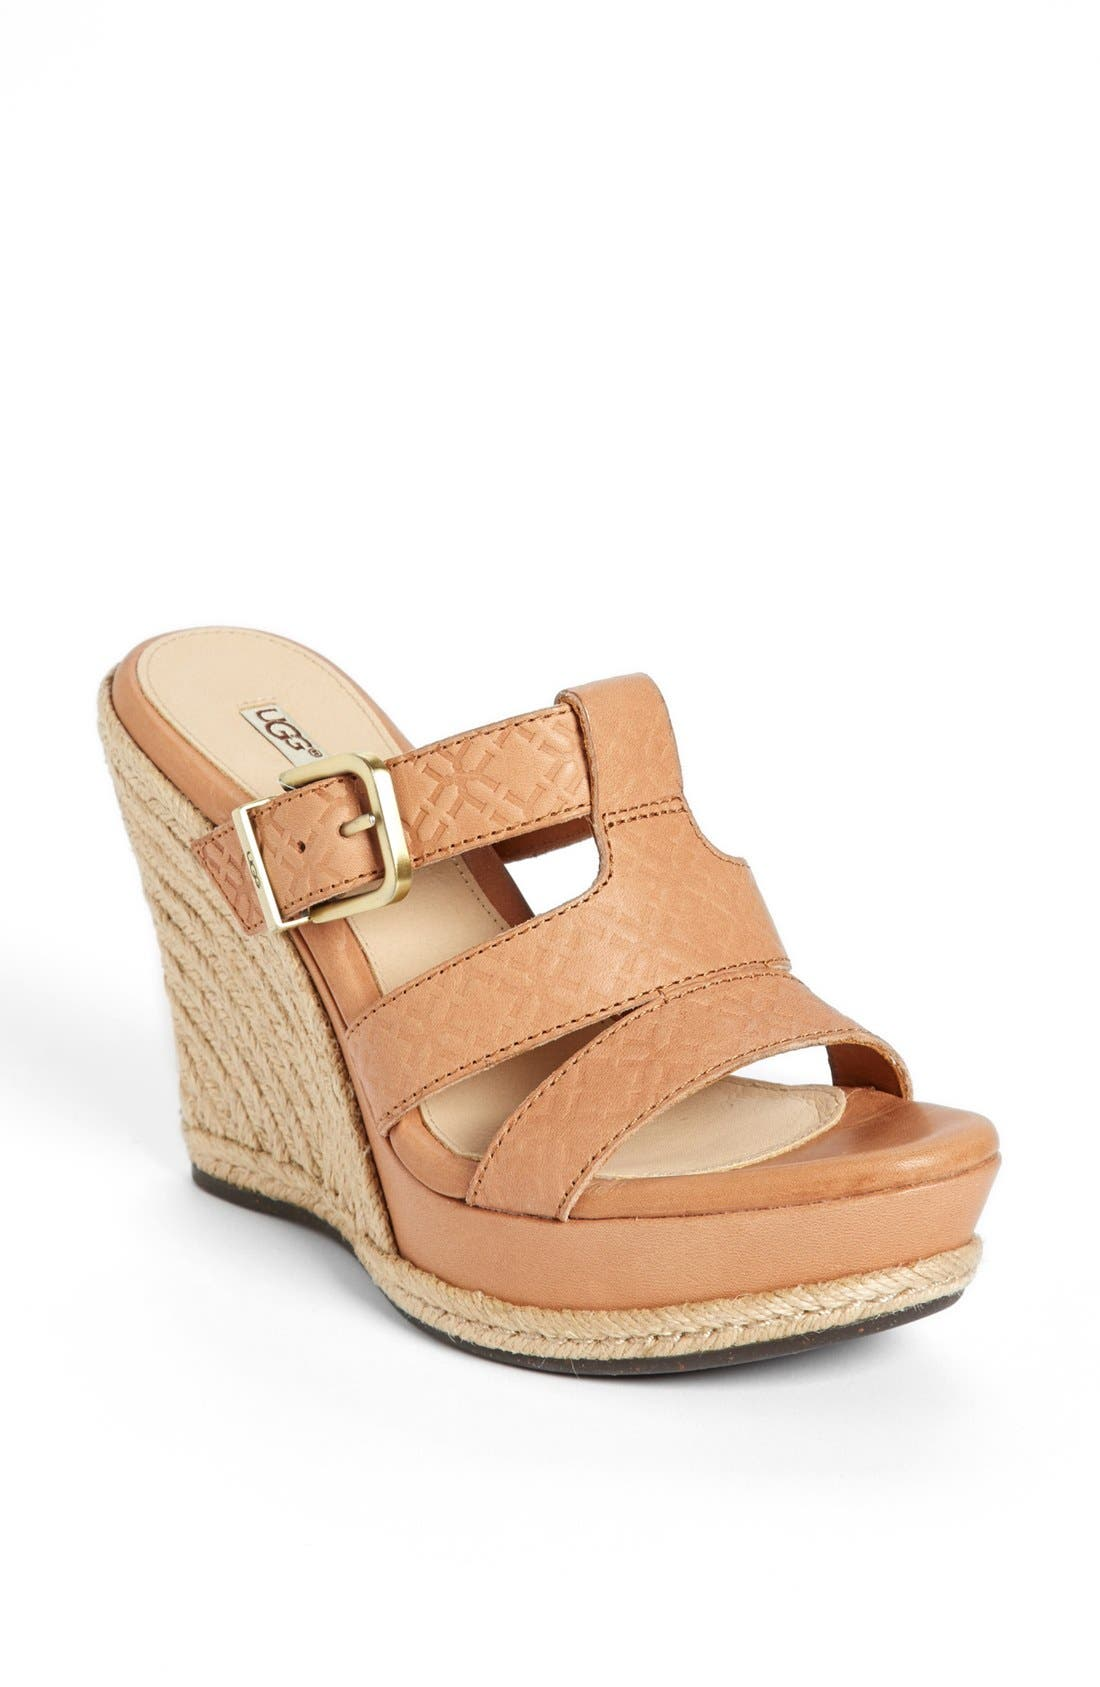 Alternate Image 1 Selected - UGG® Australia 'Hedy' Sandal (Women)